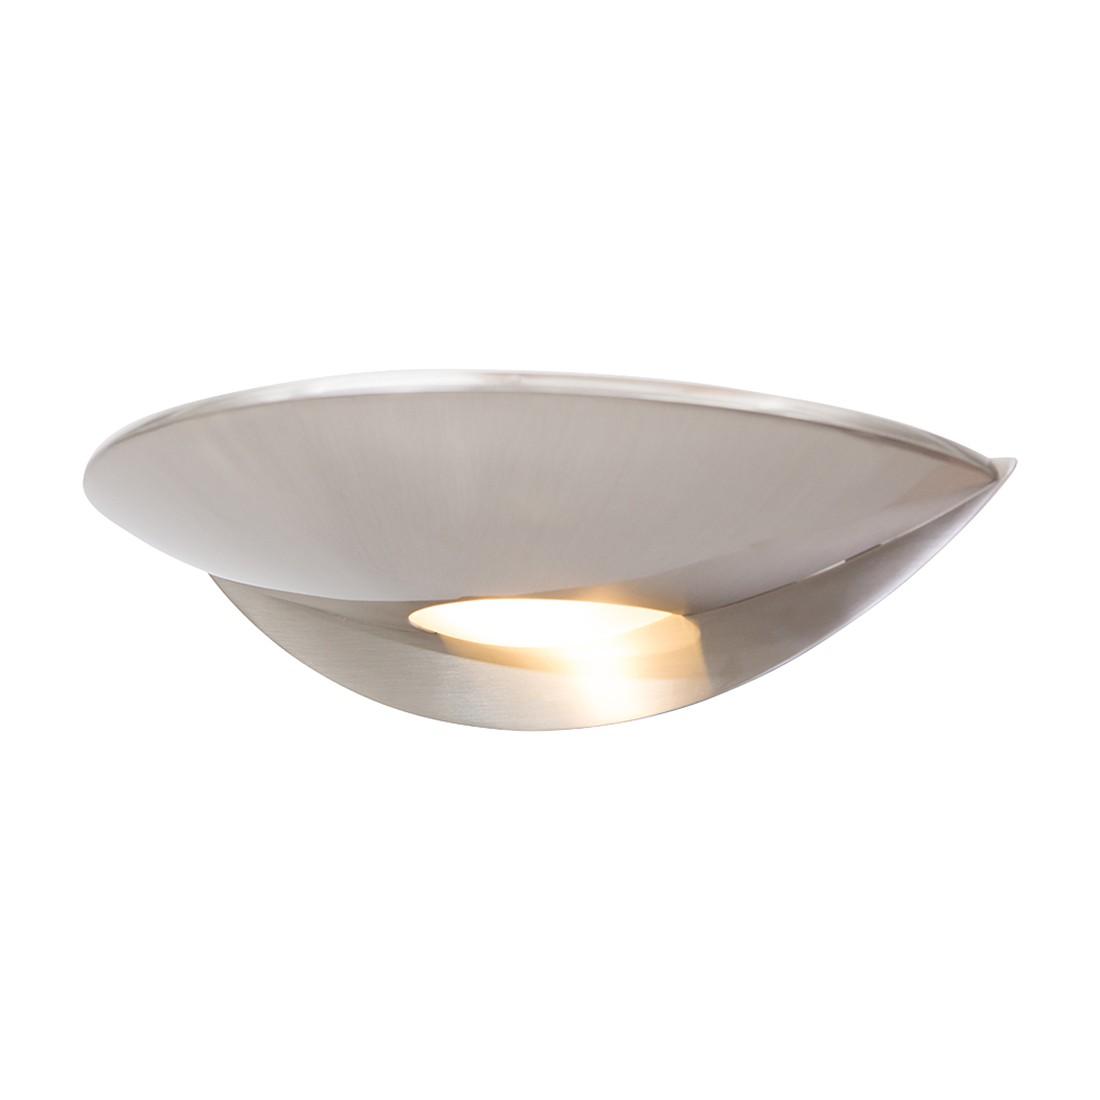 led wandleuchte tamara 2 flammig nickel matt steinhauer a g nstig bestellen. Black Bedroom Furniture Sets. Home Design Ideas